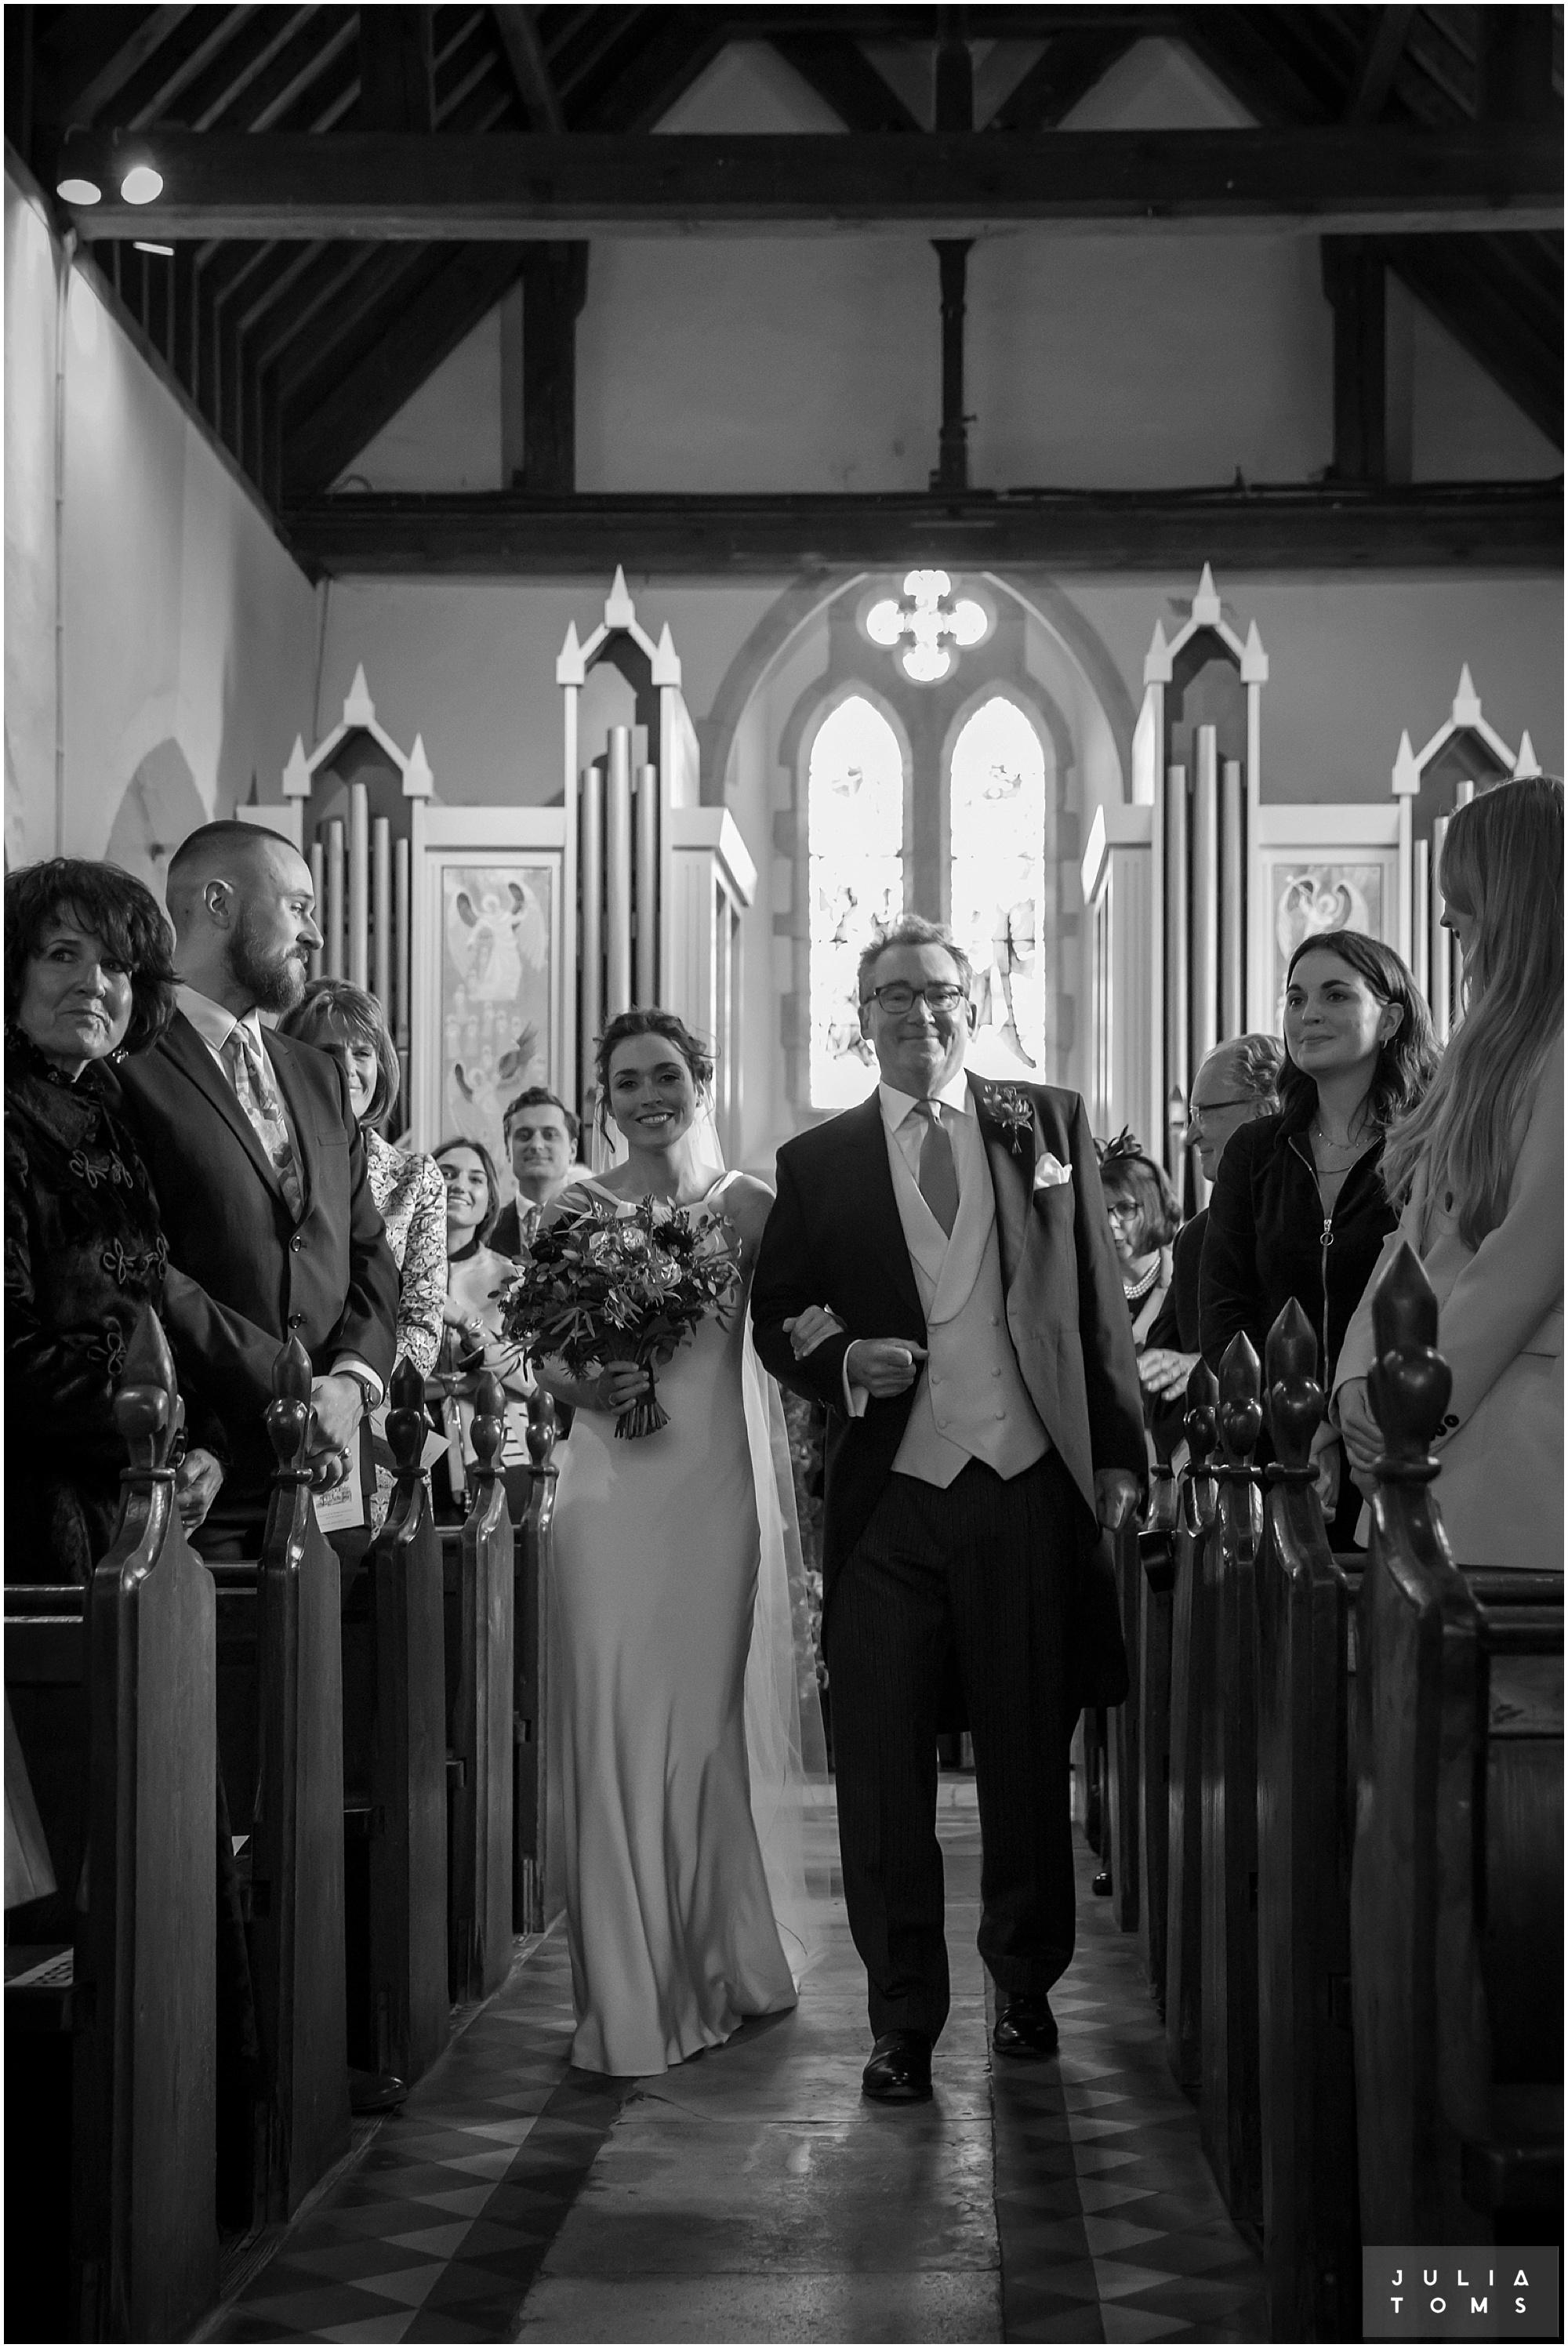 Southend_barn_wedding_photographer_juliatoms_005.jpg